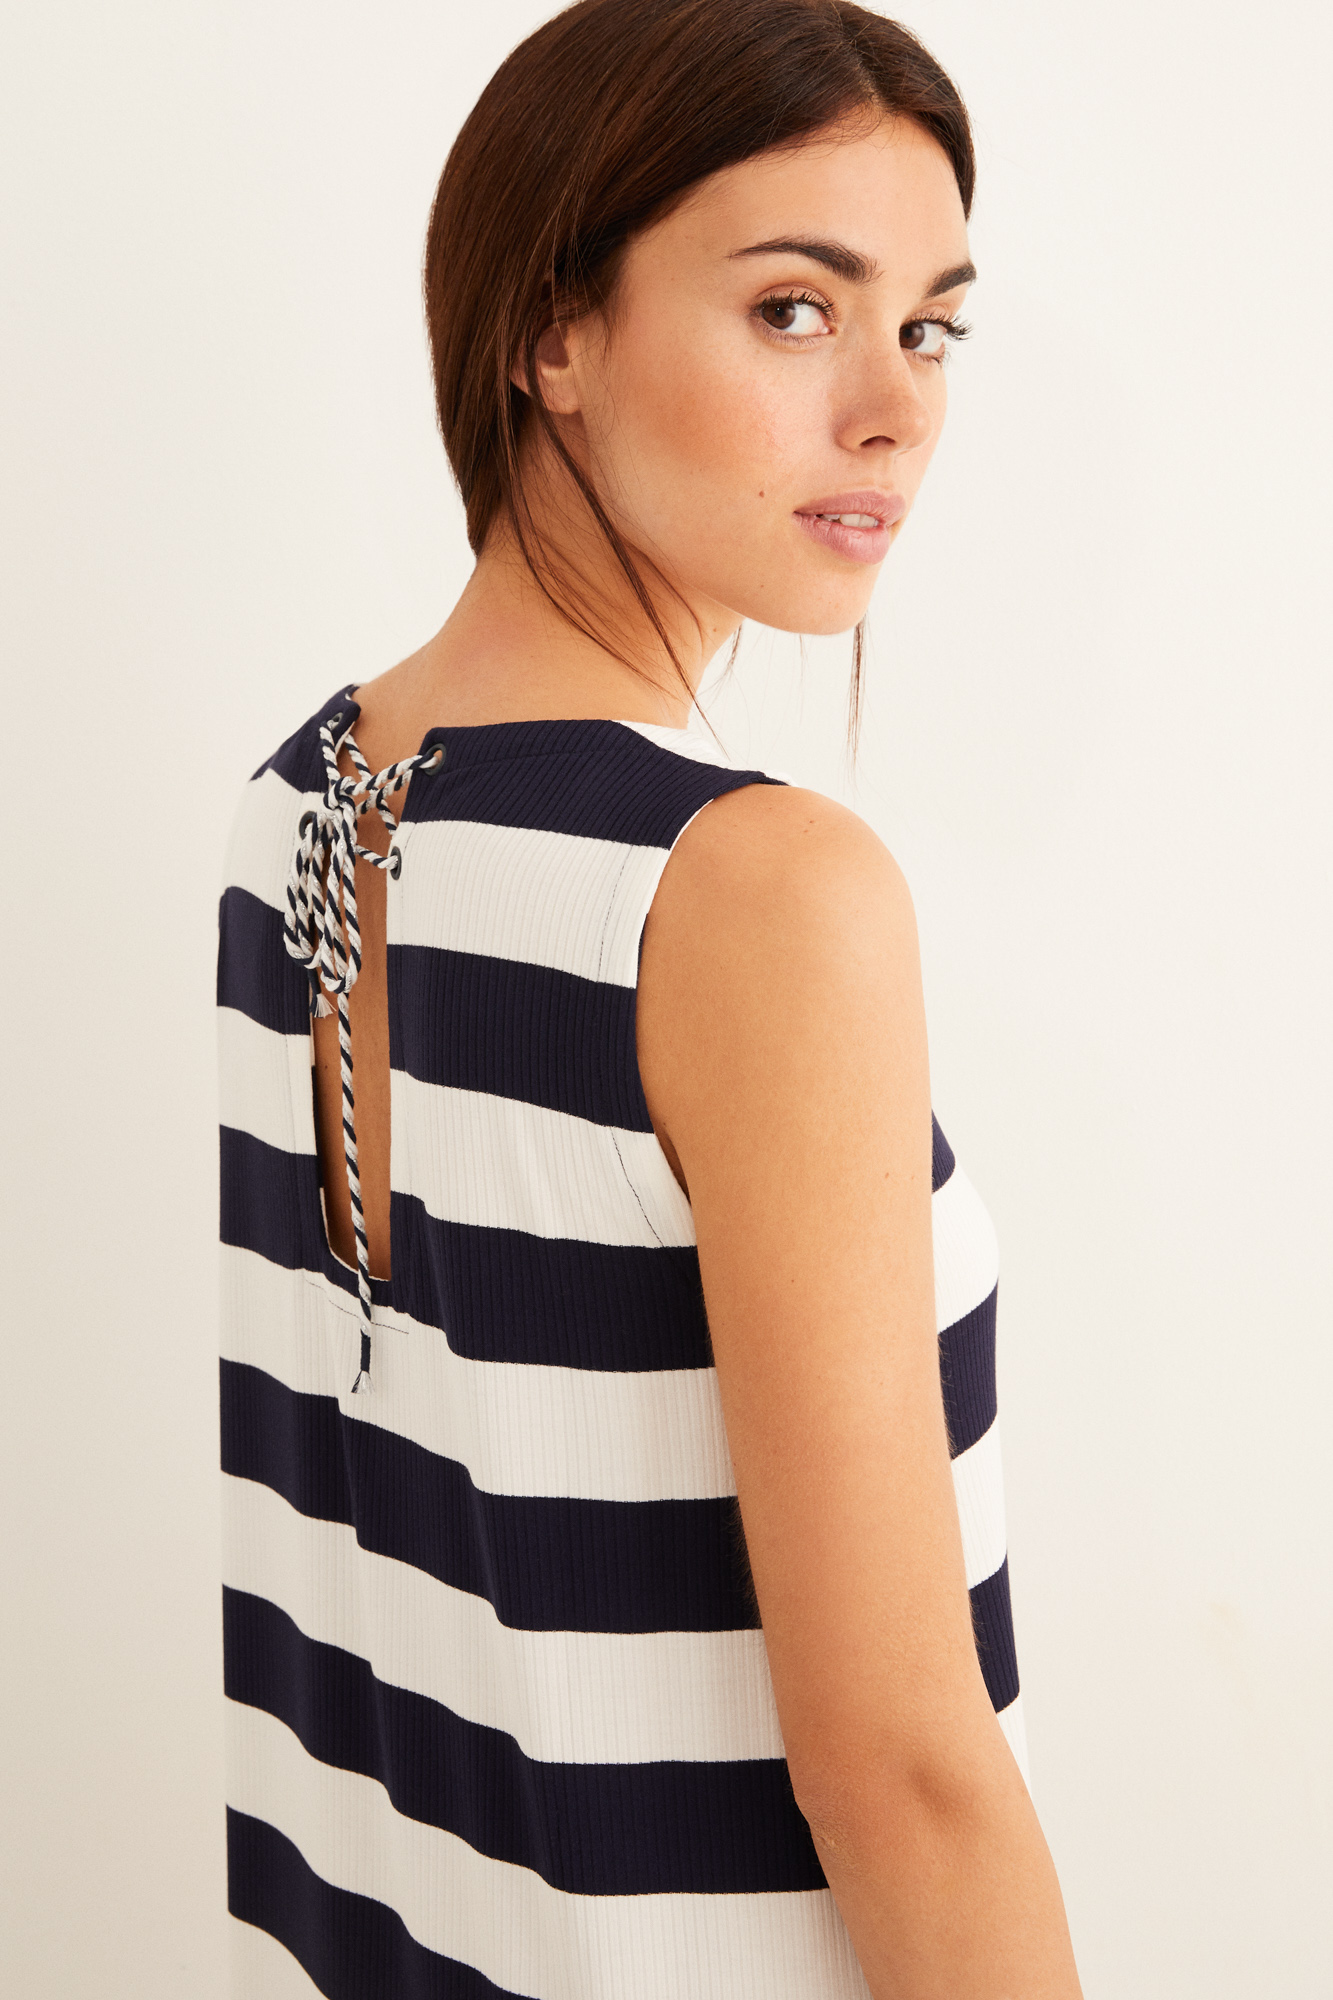 Vestido navy cordón espalda   Beachwear   Women'secret